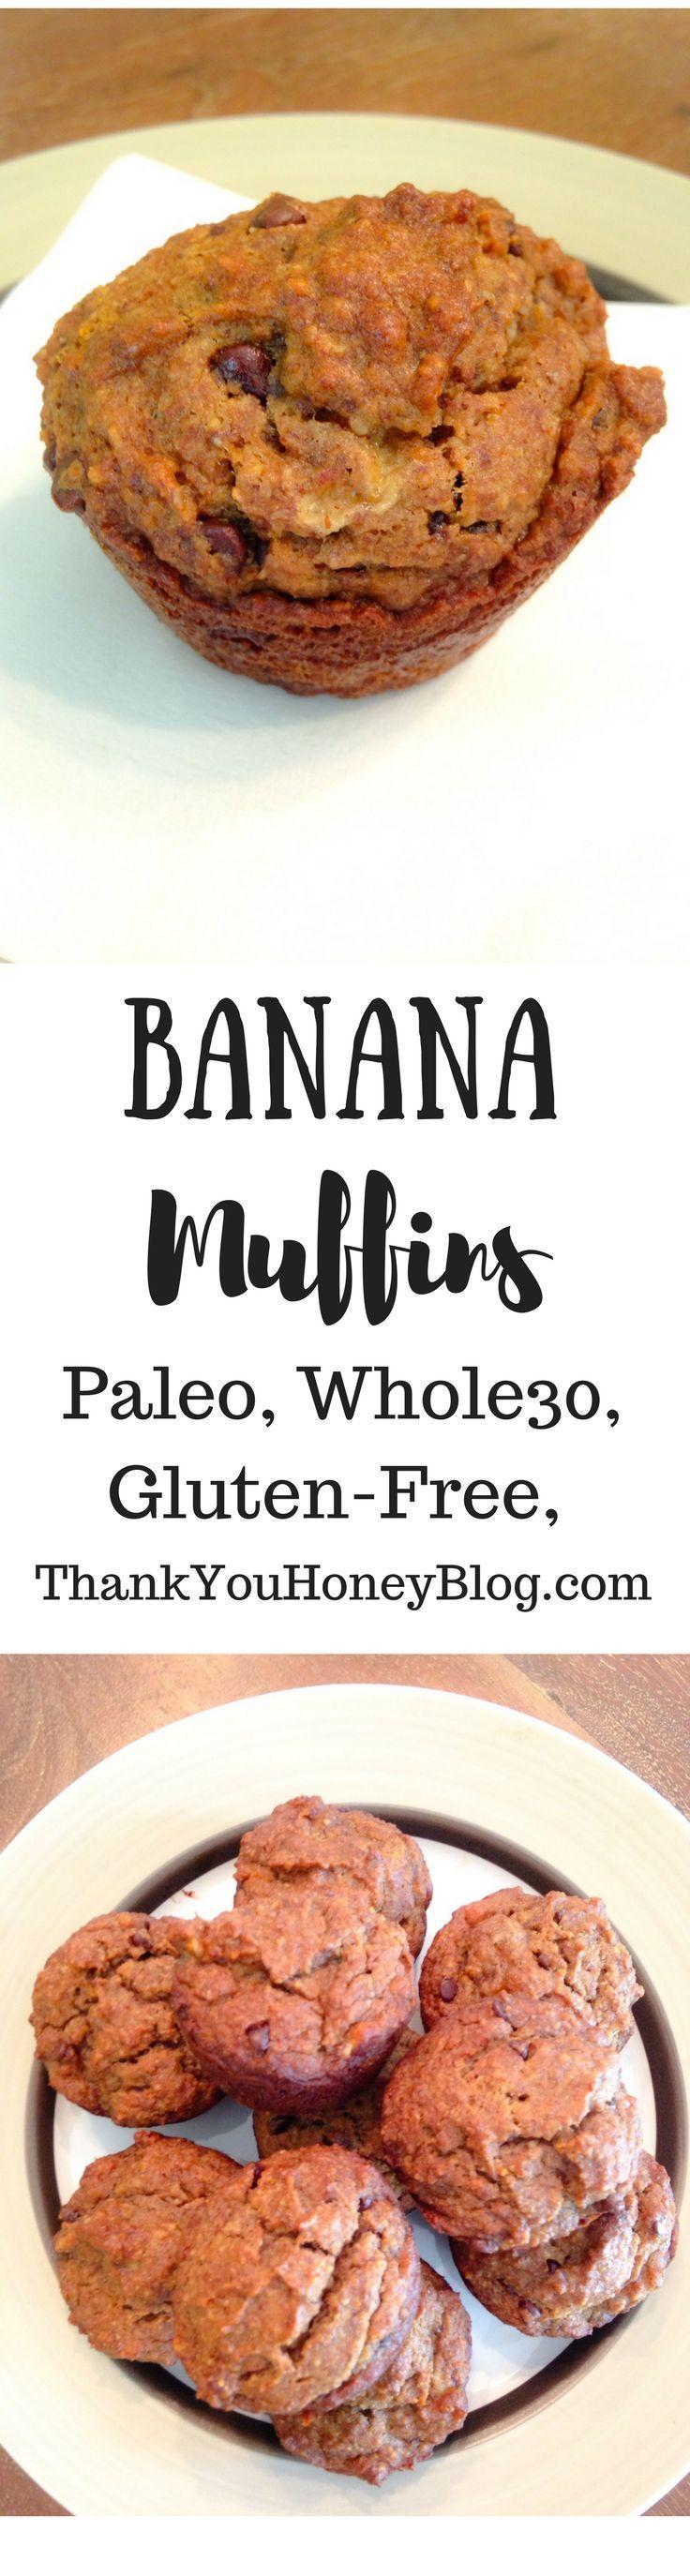 through & PIN IT to read later & Follow + Subscribe! Banana Muffins, Paleo, Gluten- Free, Grain- Free, Healthy, Banana, Simple Recipe, Breakfast, Brunch, Recipe, Paleo Recipe, Snack, Muffins, Whole 30, Easy Recipe,